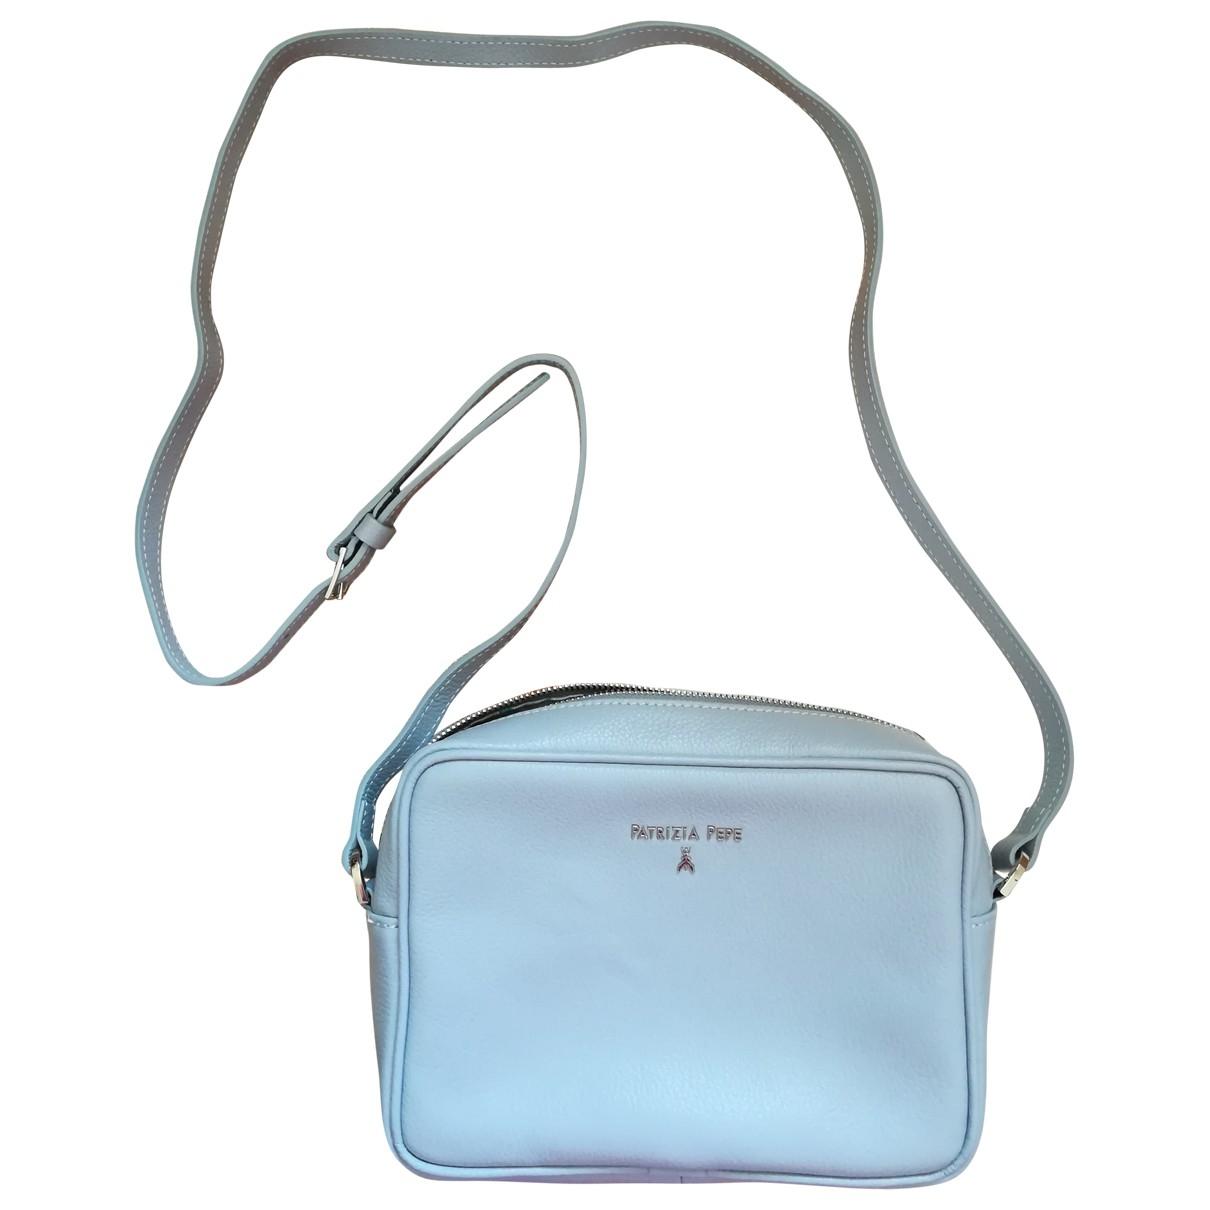 Patrizia Pepe \N Handtasche in  Blau Leder